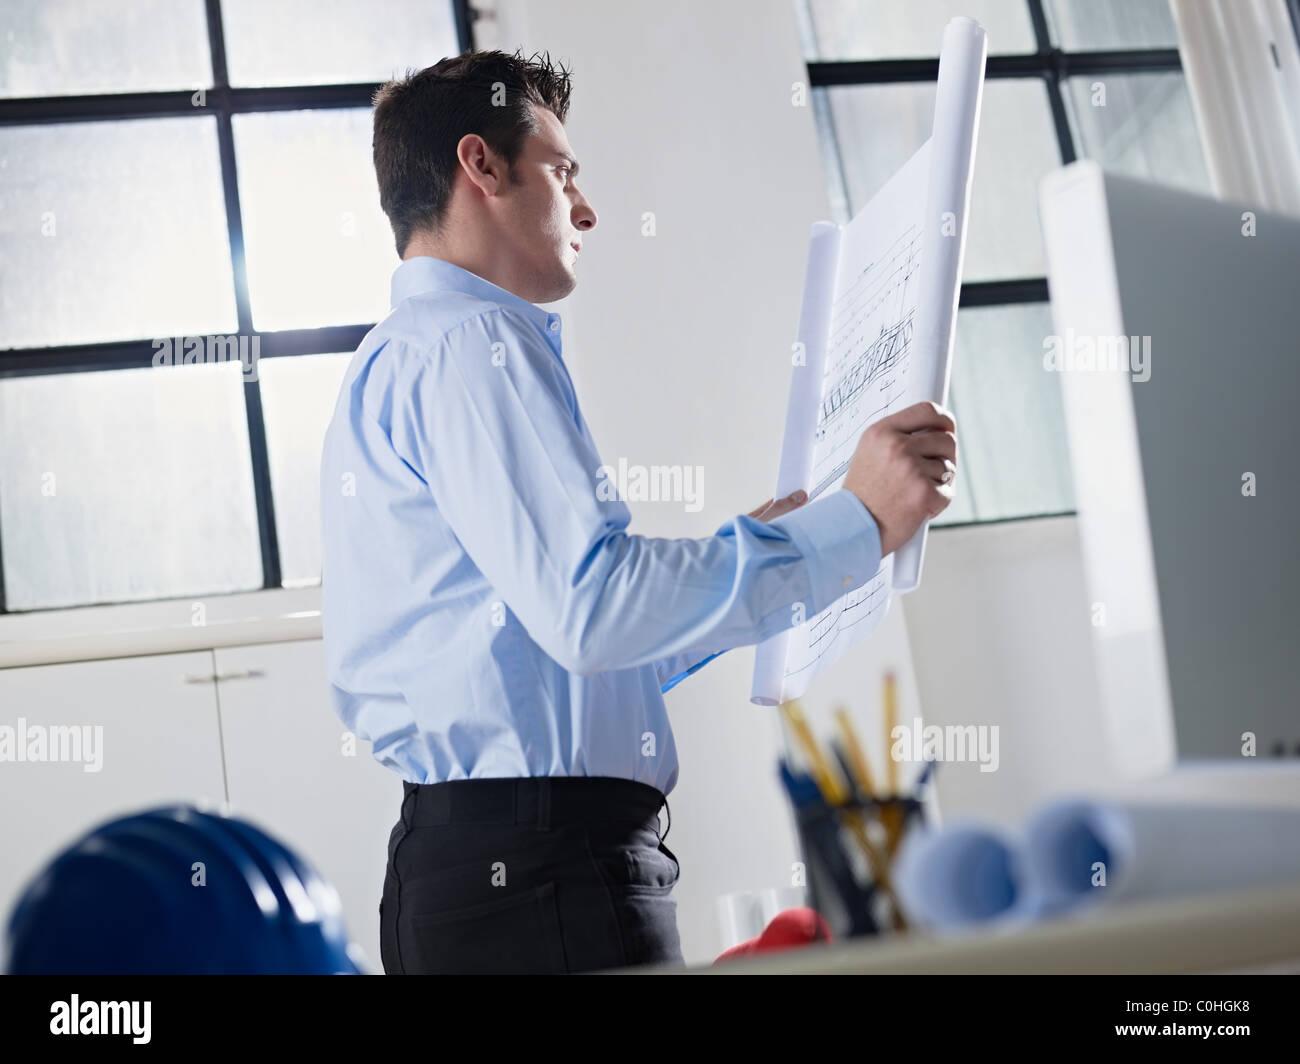 A mediados adulto varón caucásico arquitecto examinar un plan de construcción. De forma horizontal, Imagen De Stock